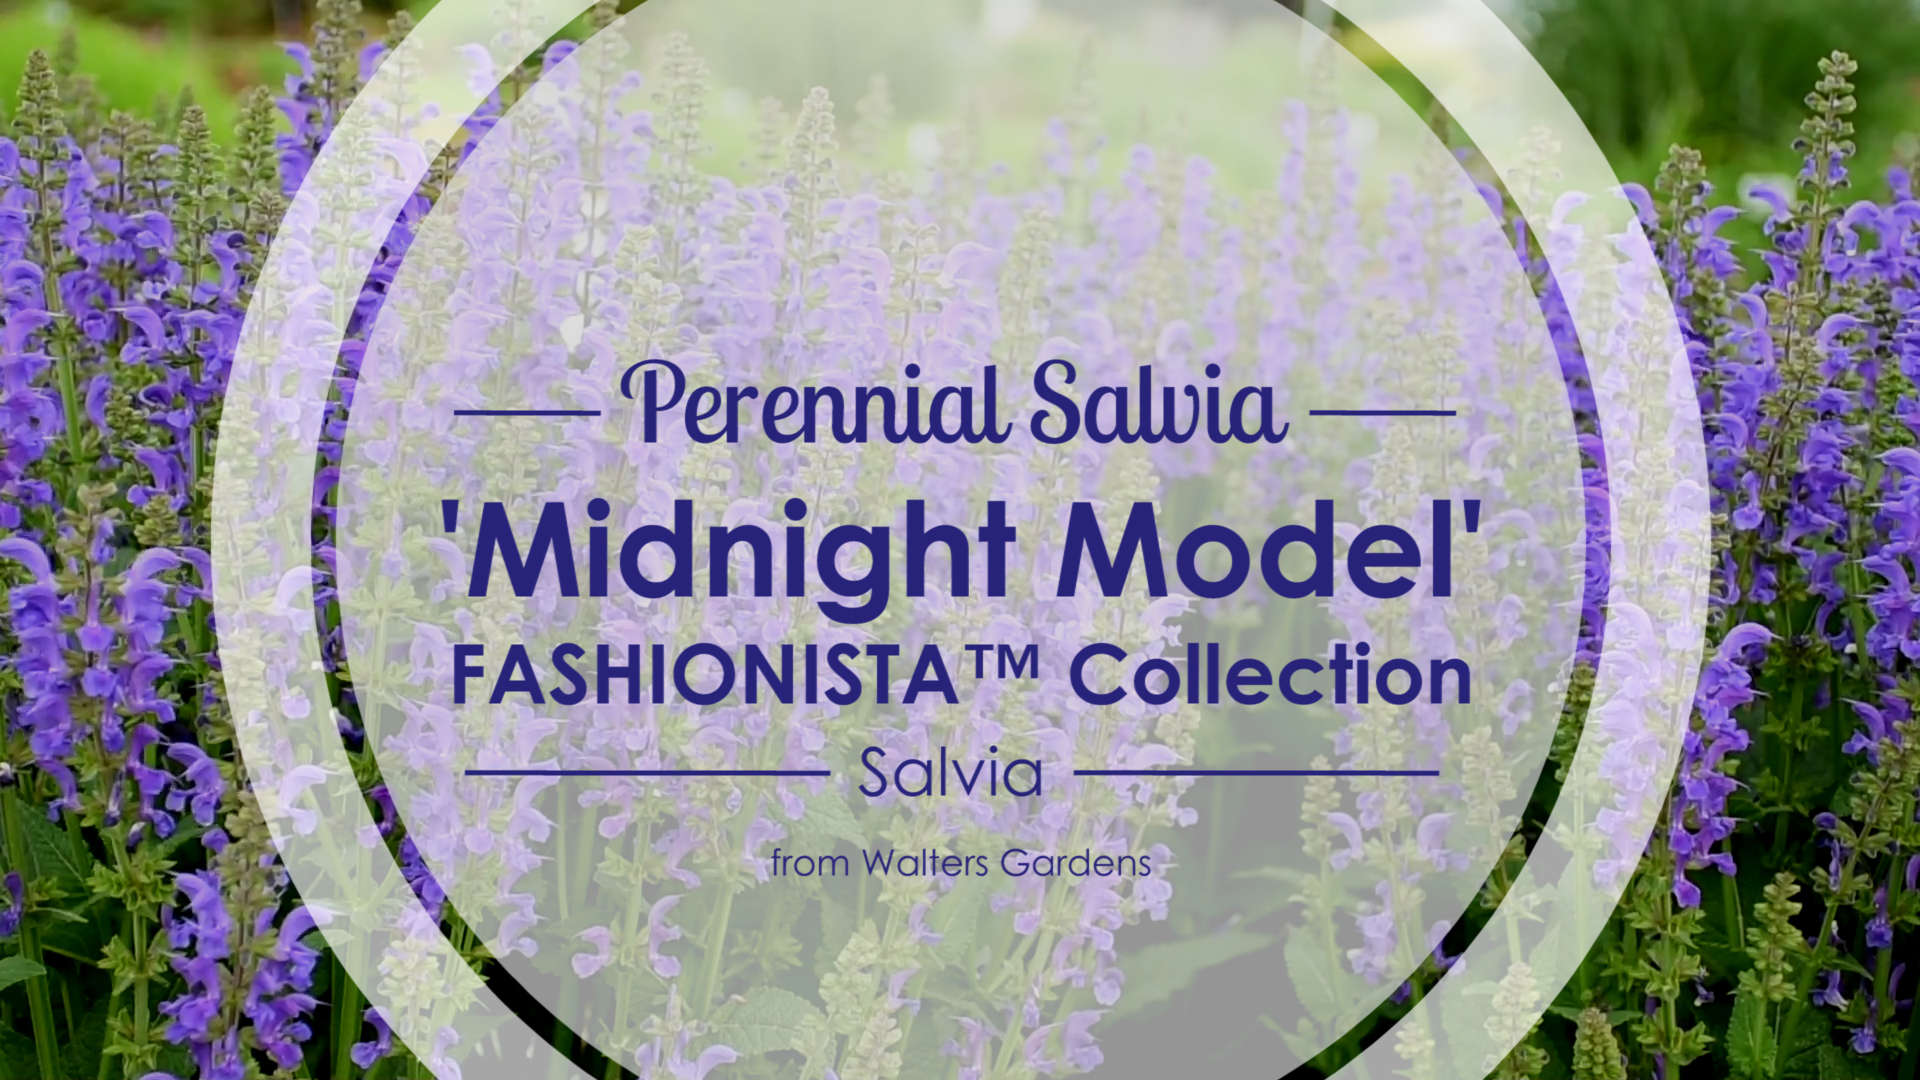 Salvia 'Midnight Model' Perennial Salvia